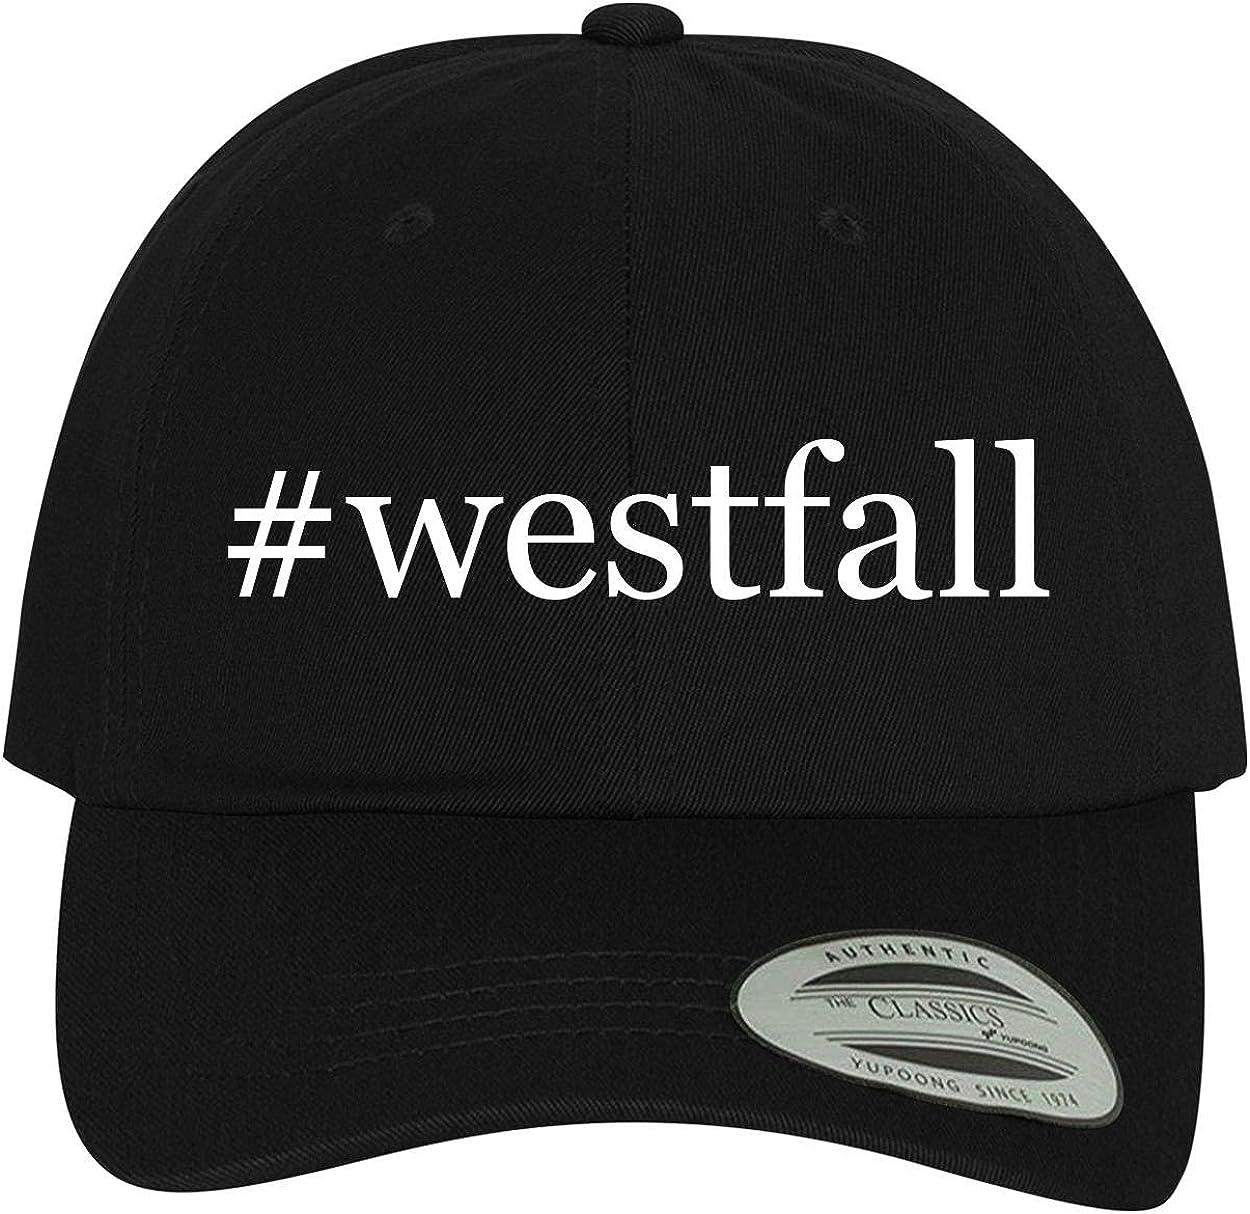 Comfortable Dad Hat Baseball Cap BH Cool Designs #Westfall